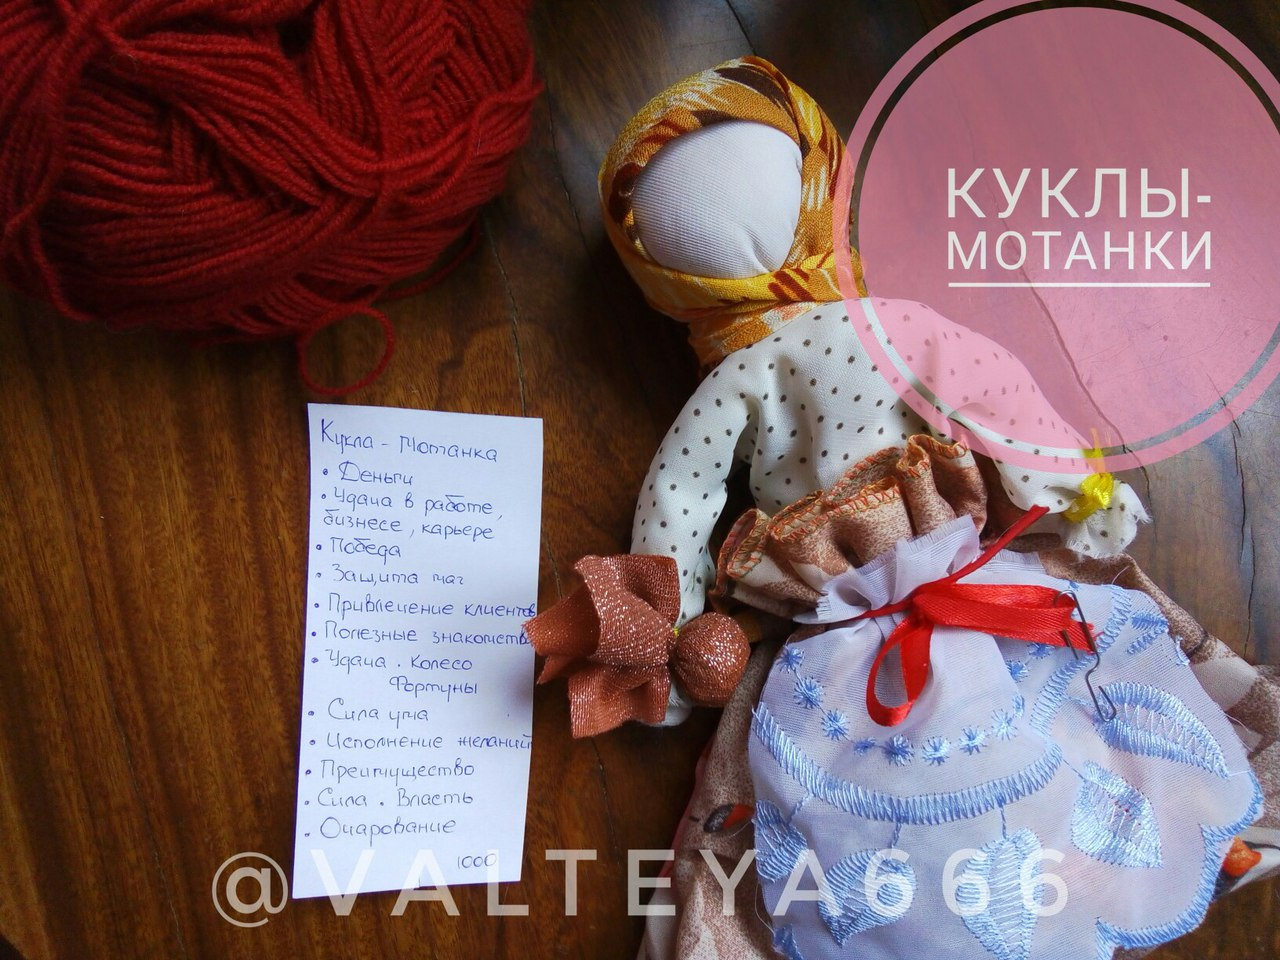 Славянские амулеты-талисманы Куклы-мотанки 0MbwJyx7_v8